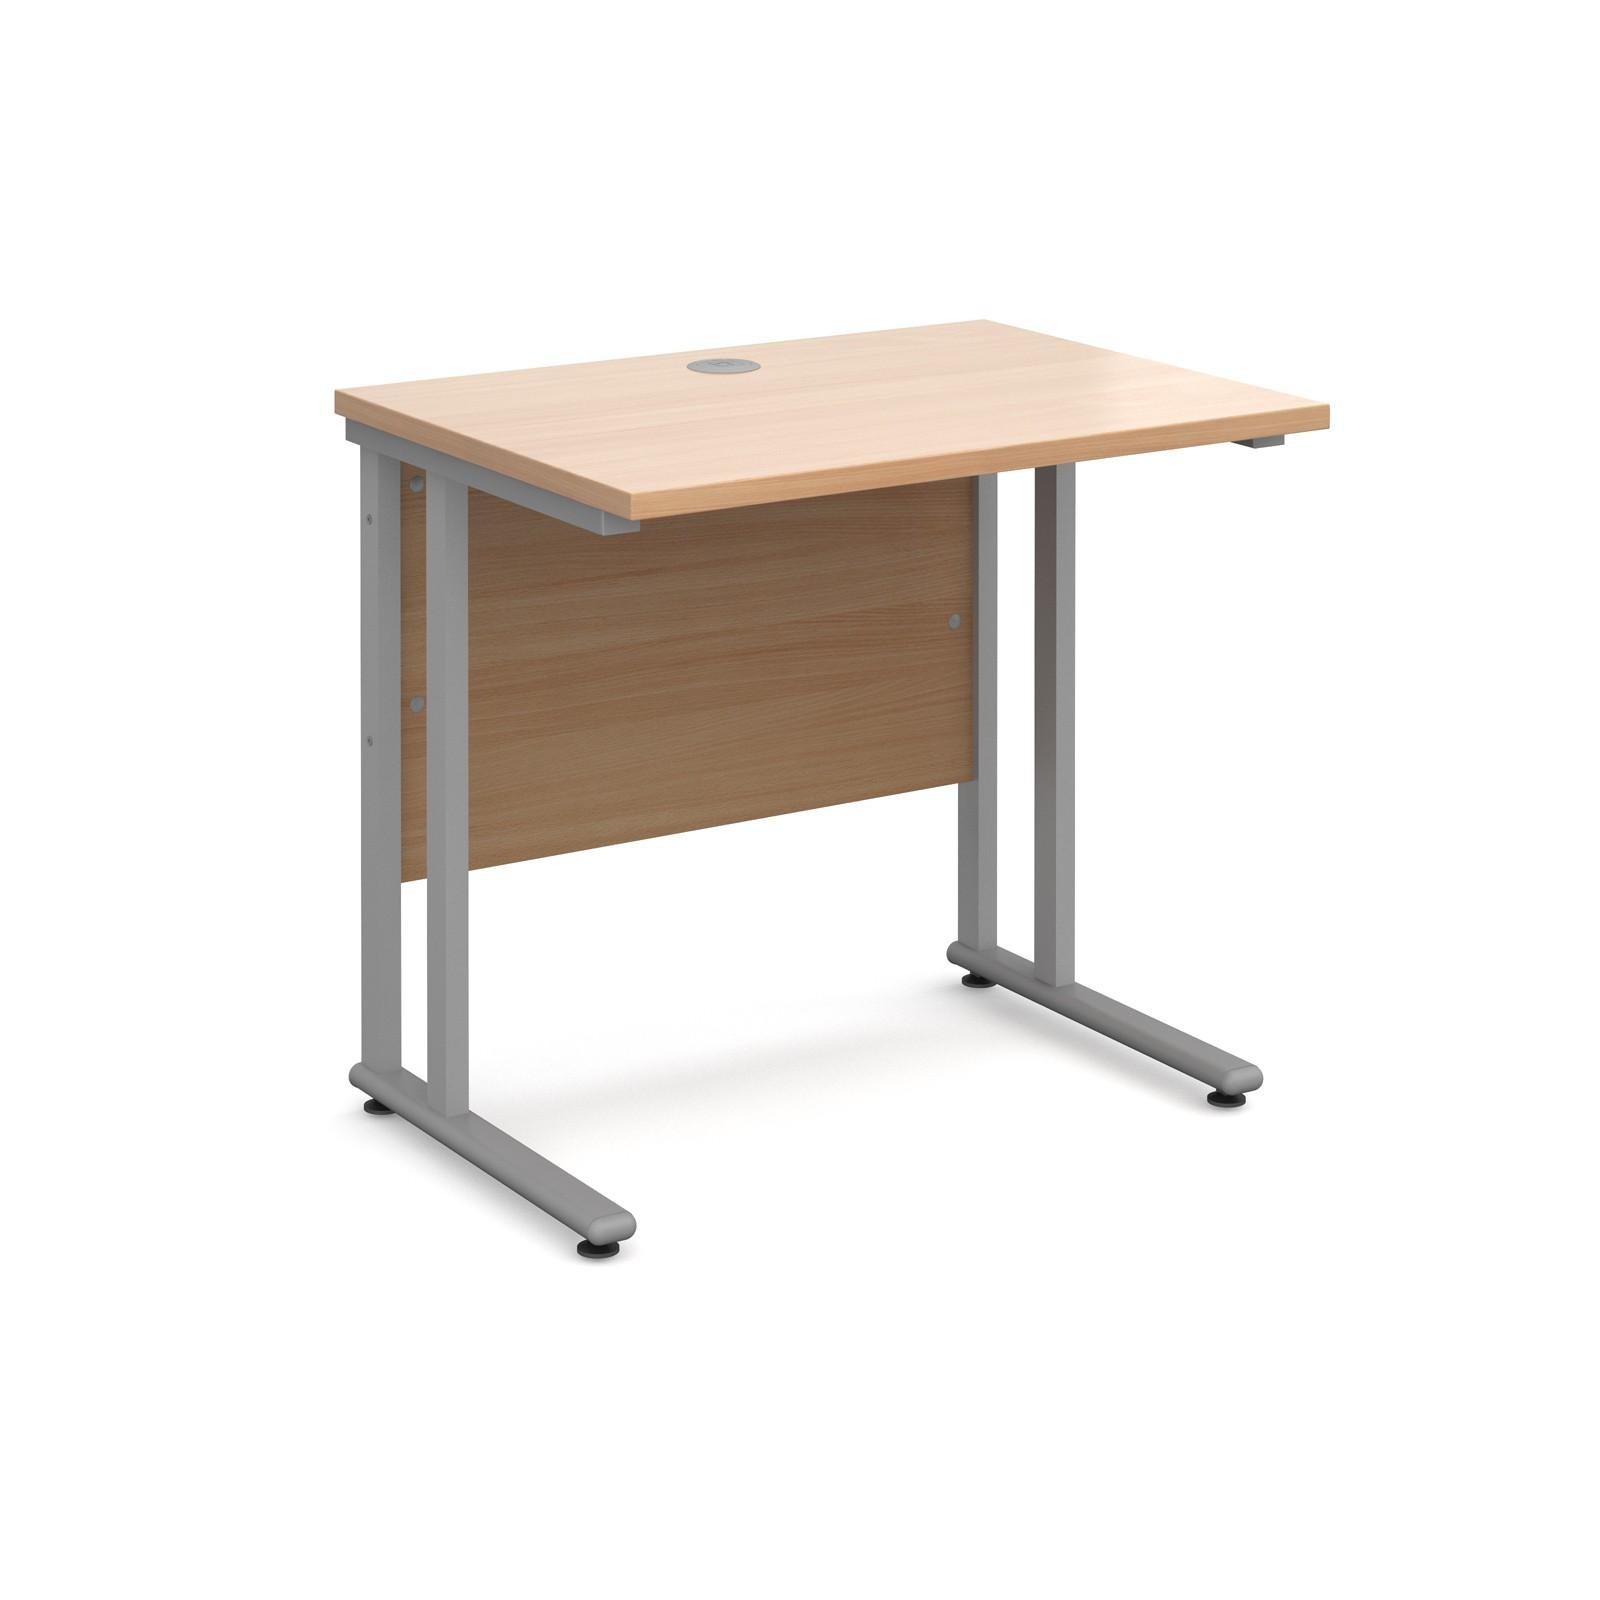 CALEY Beech 800 x 600 Straight Desk Silver Cantilever Frame | The ...